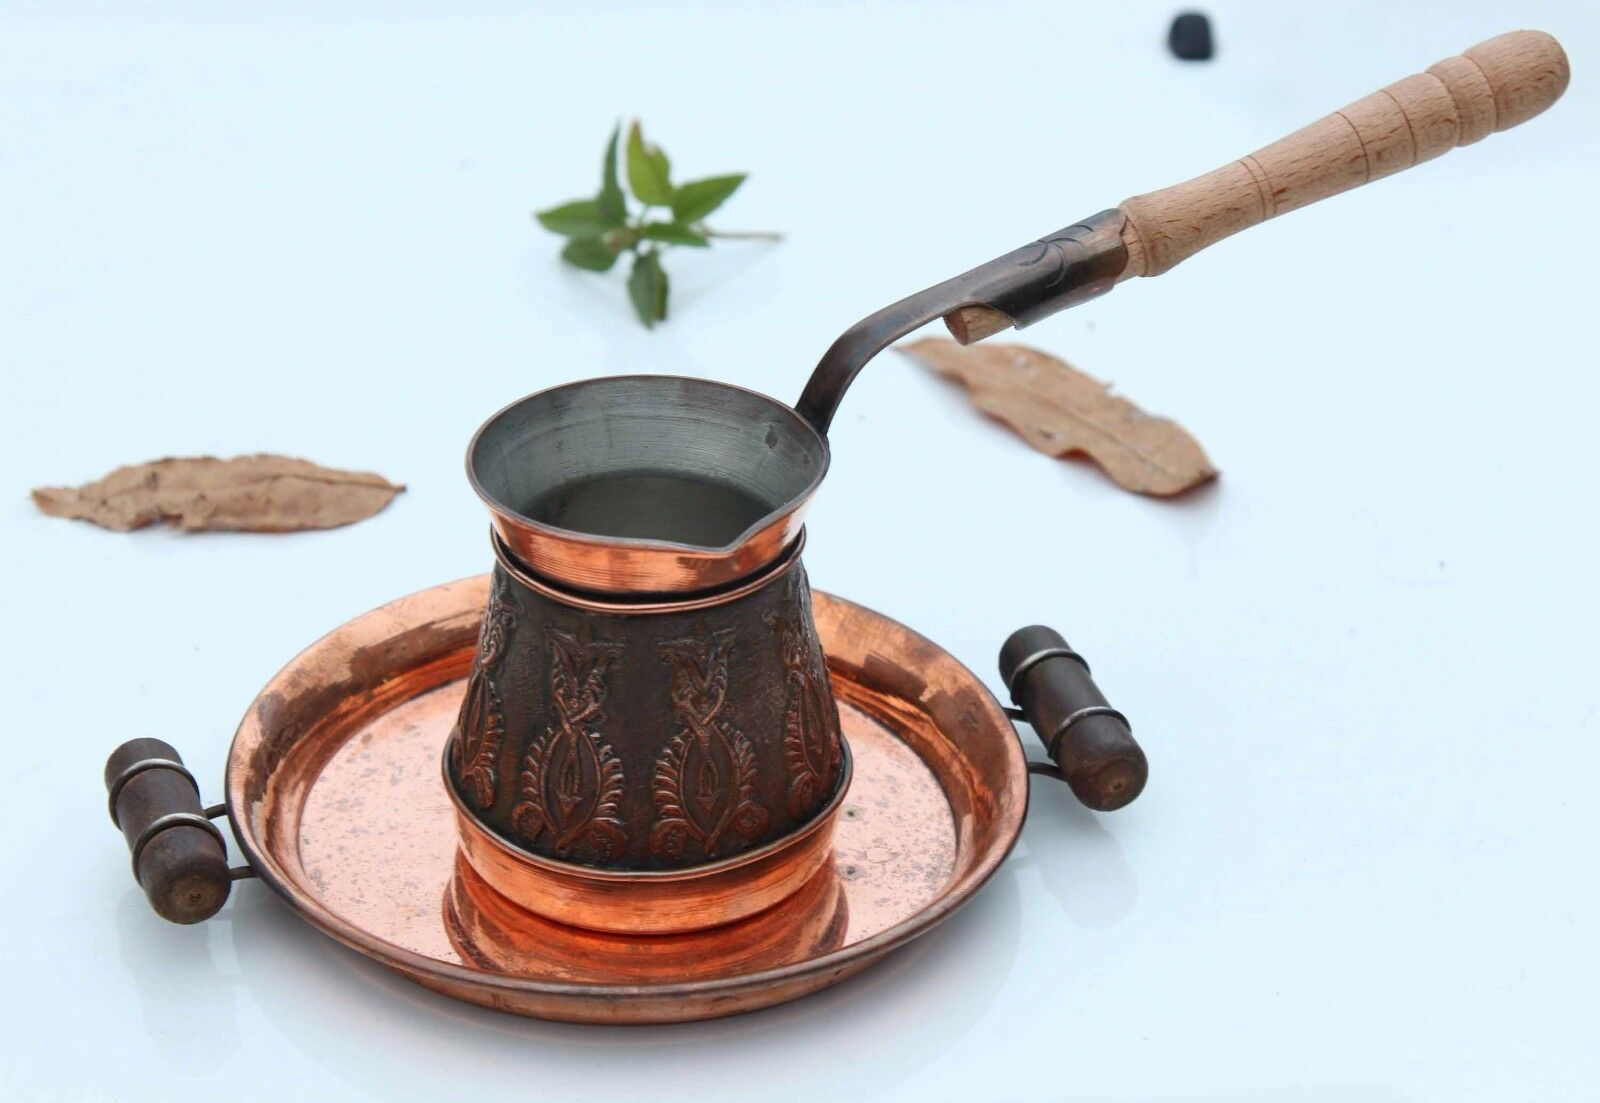 5-6 Tasse 16 Oz (environ 453.58 g) ancien Arménien Turc Coffee Maker Cezve ibrik Arménie jezve